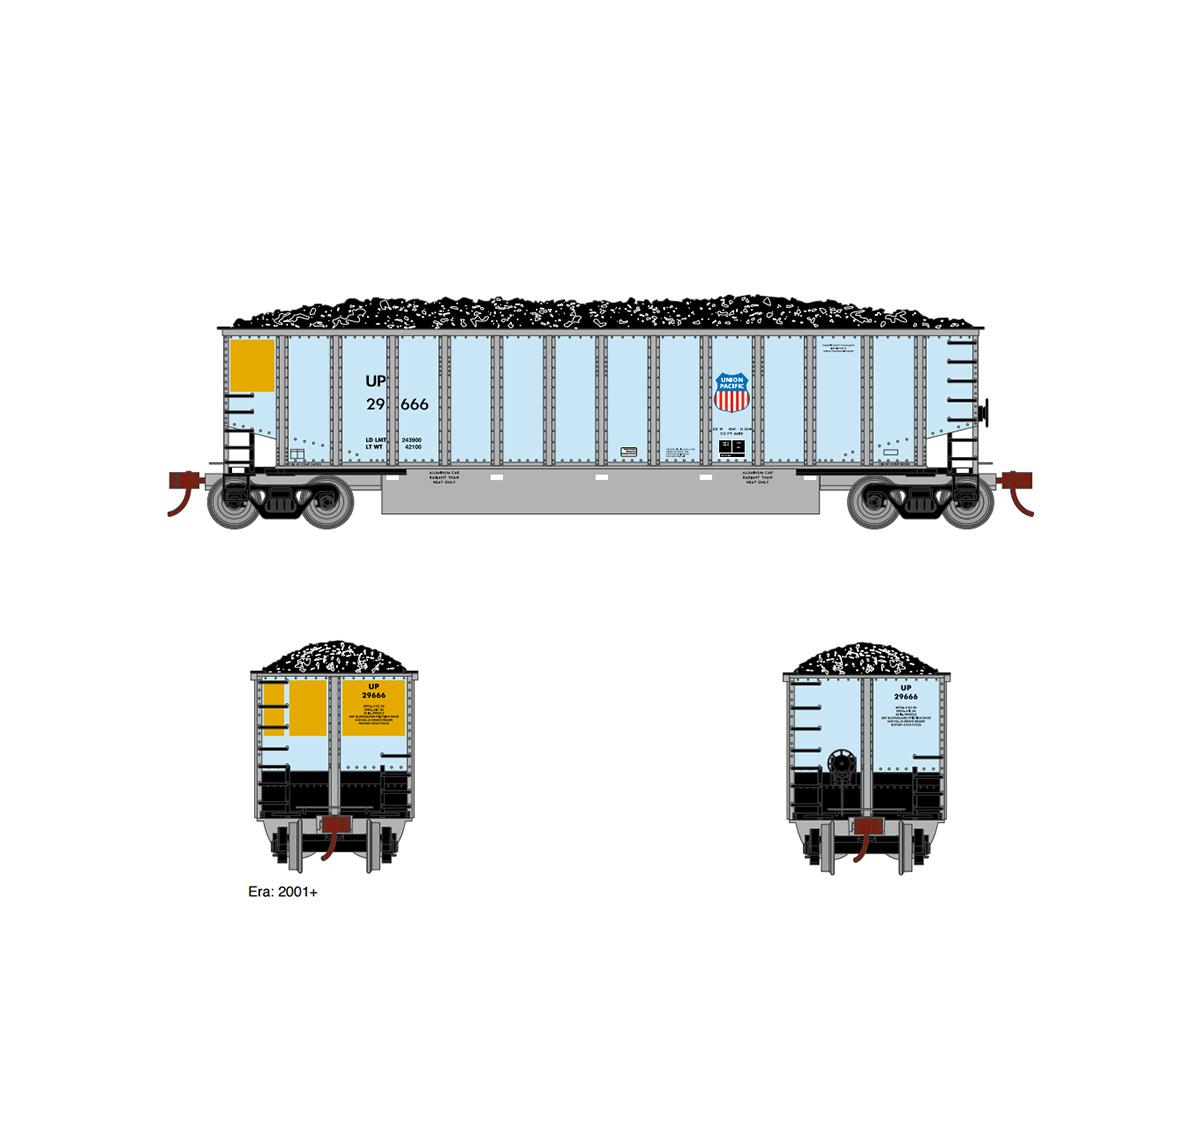 athearn_bethgon_coalporter_w-load_up_29666